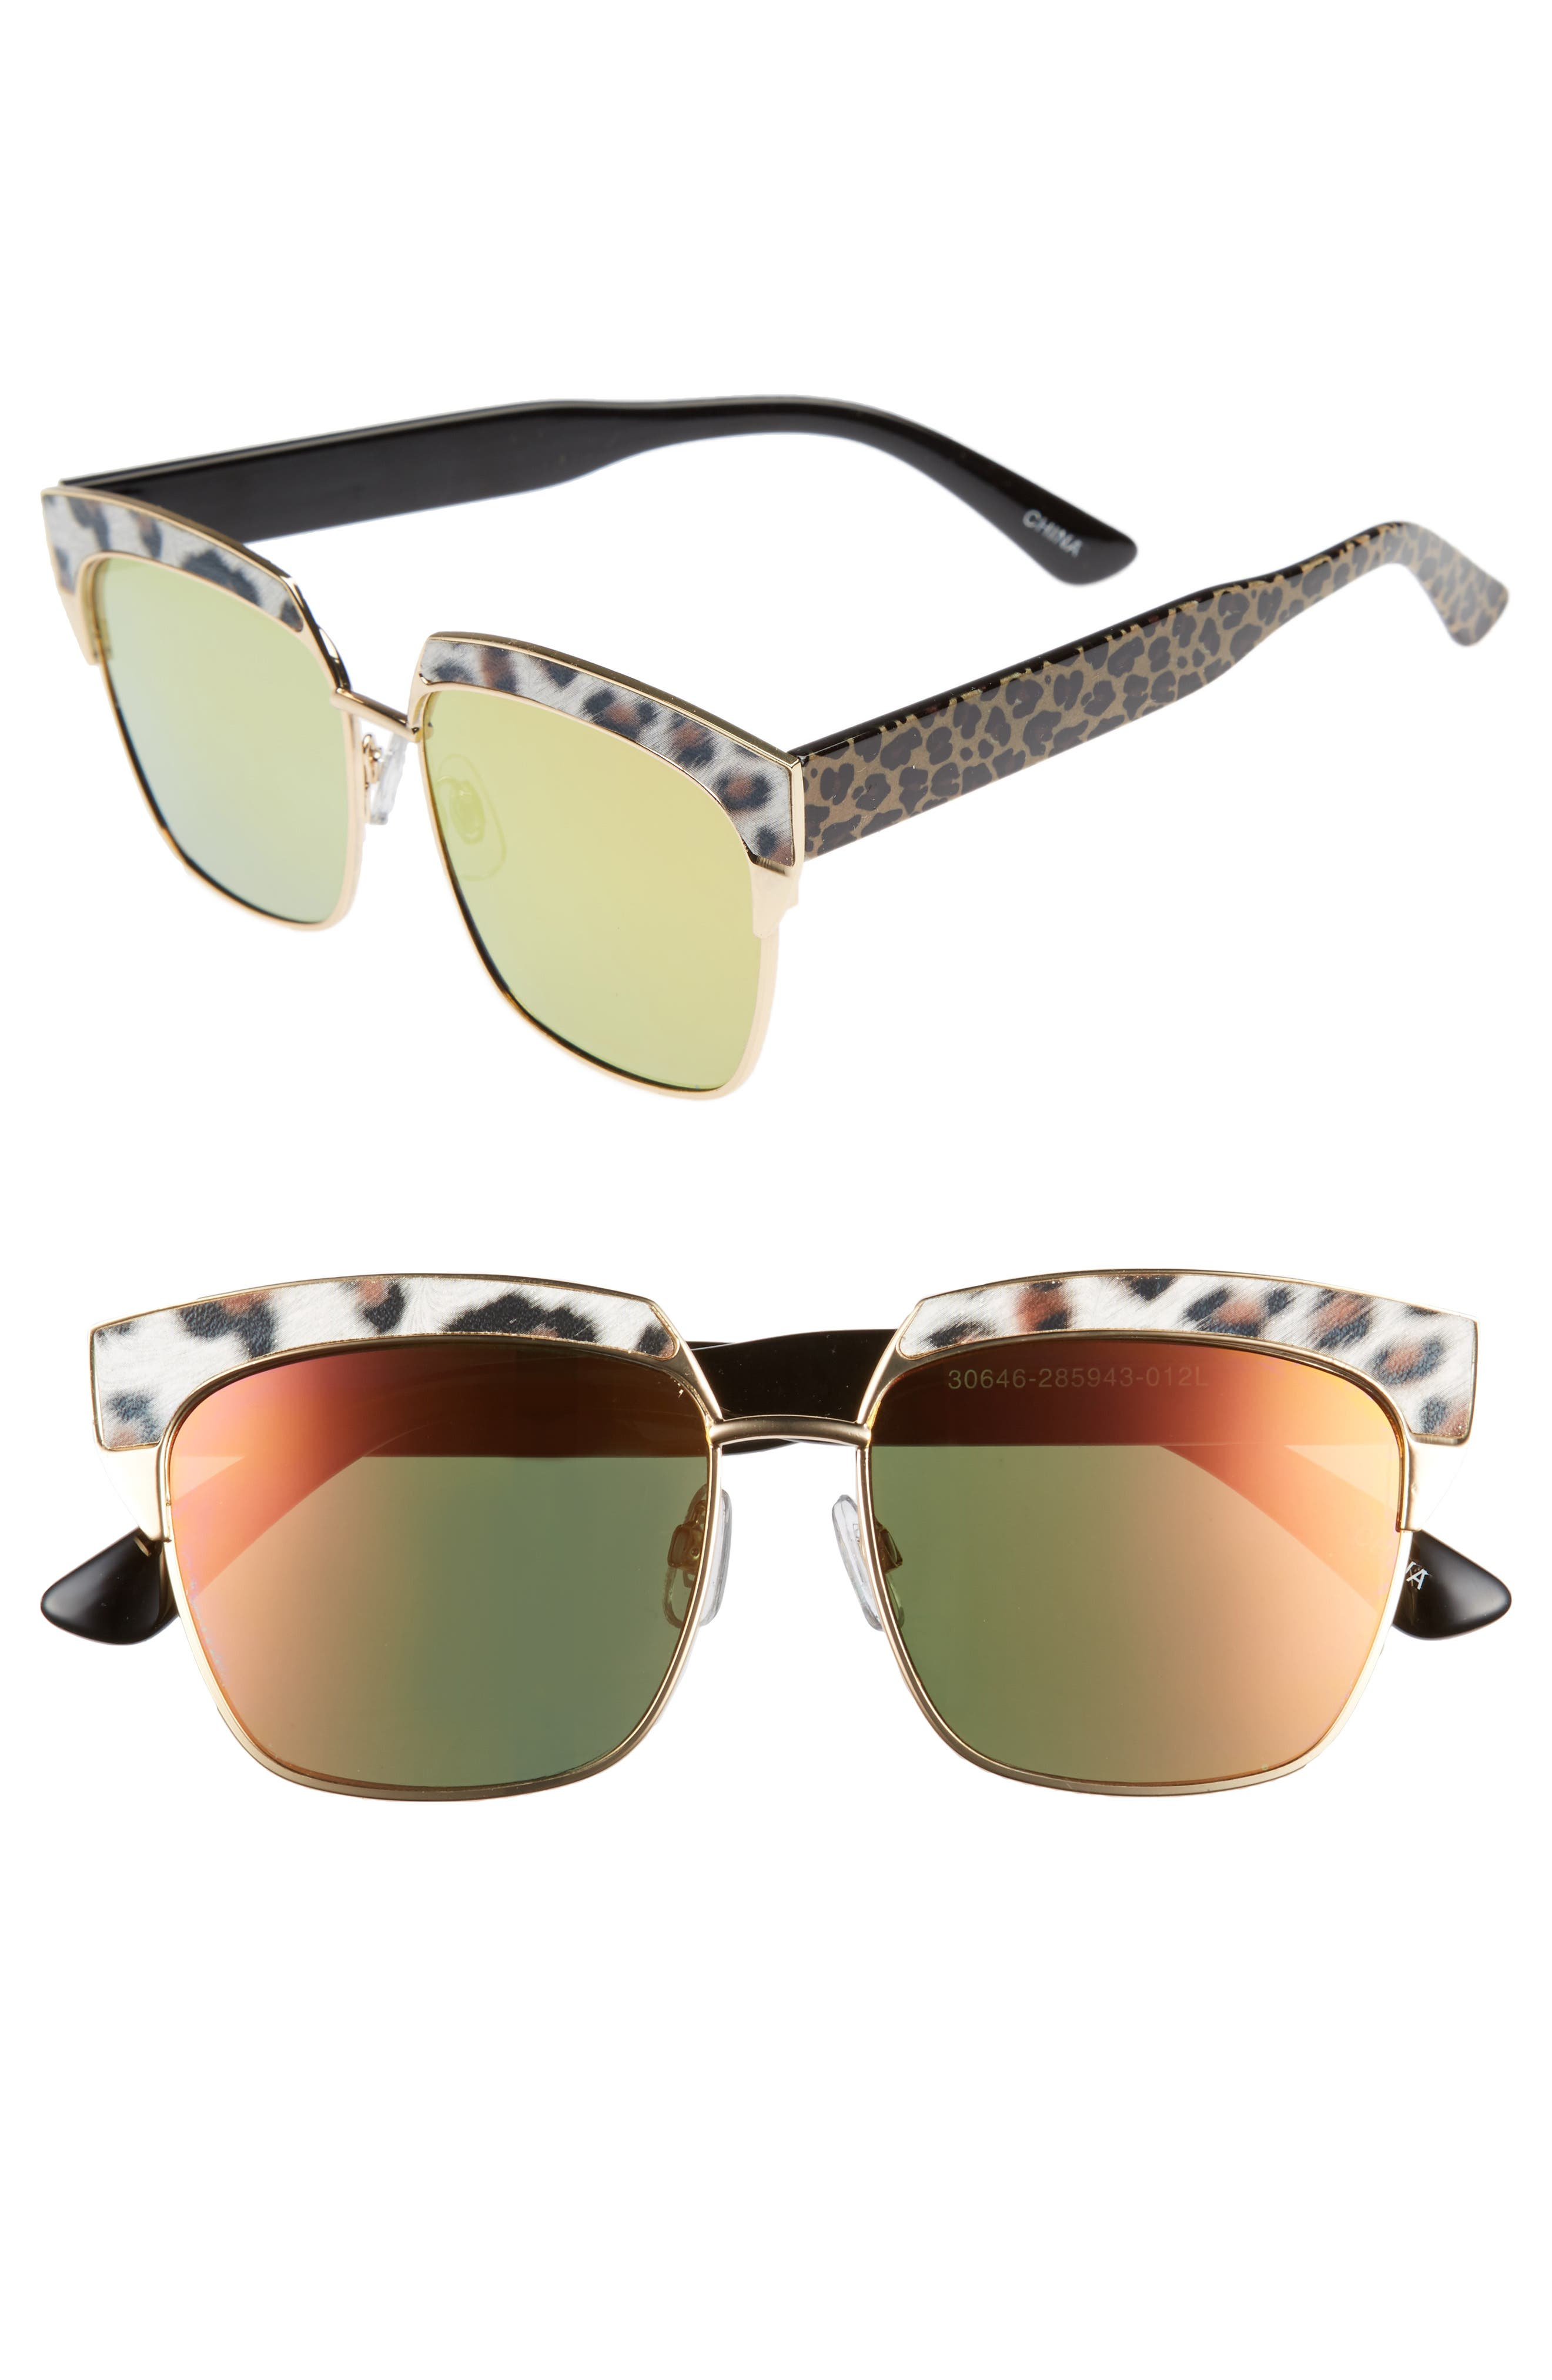 Leopard Print Top Bar Sunglasses,                             Main thumbnail 1, color,                             710